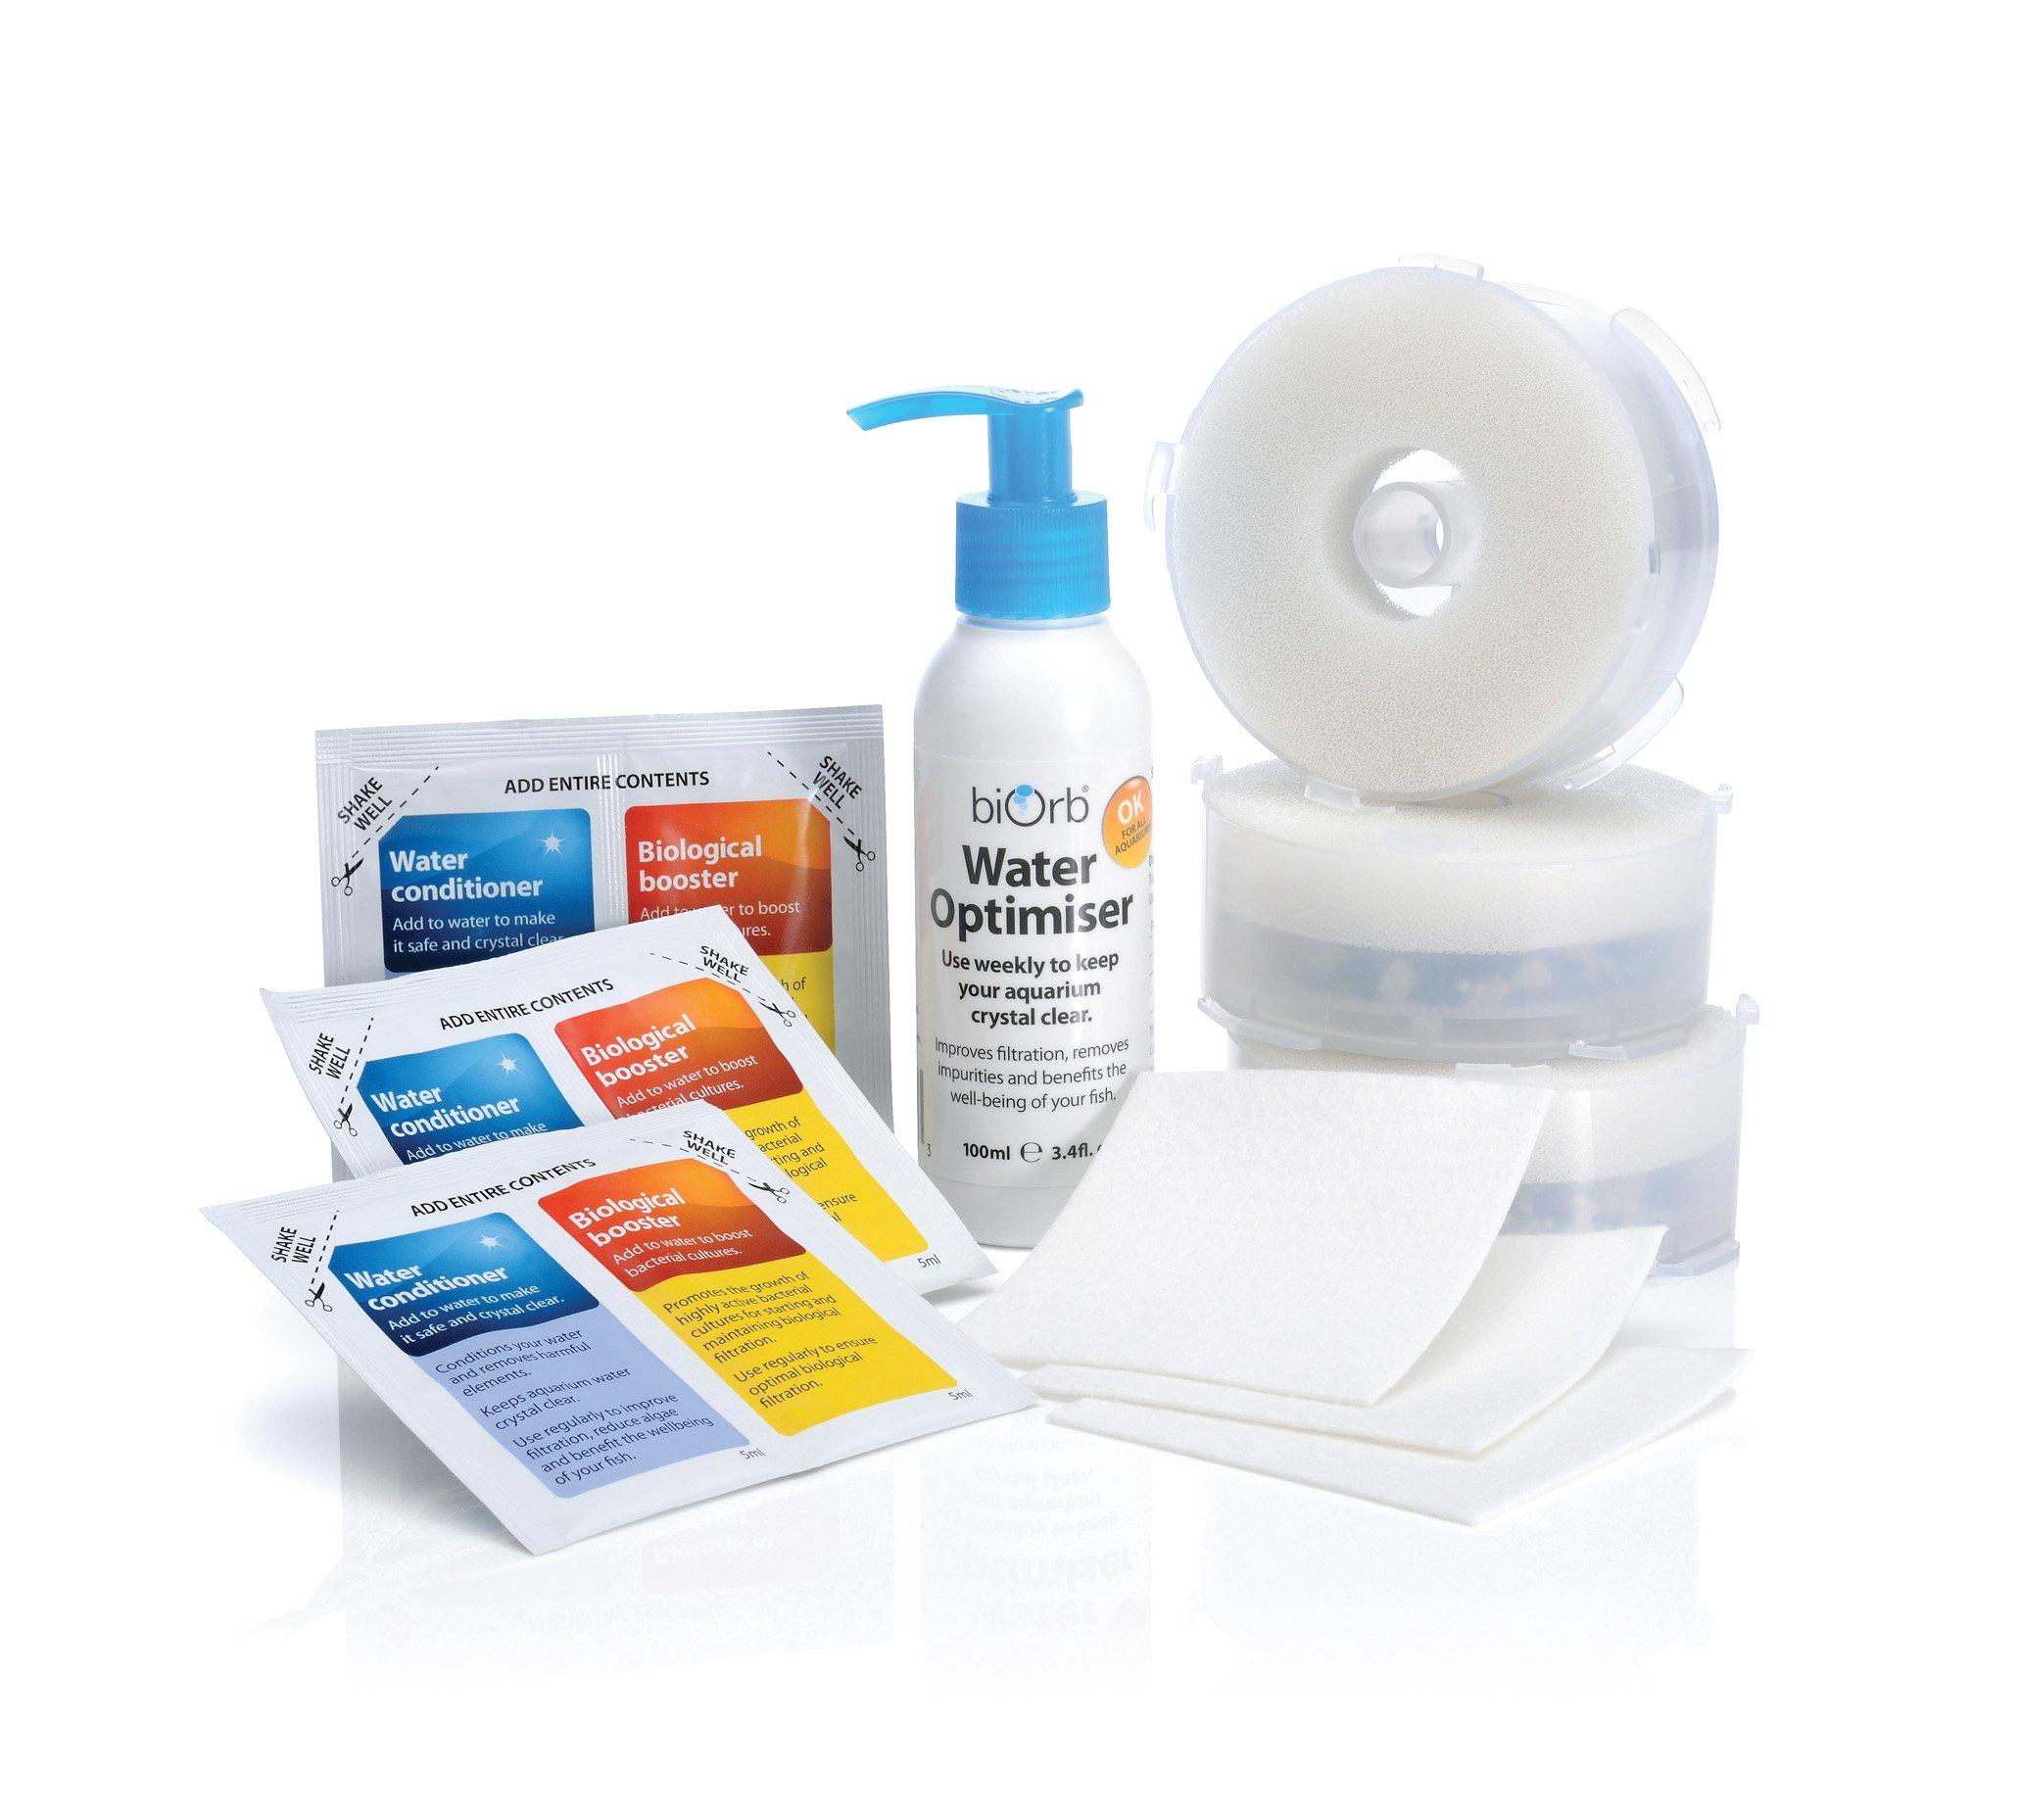 biOrb 46021.0 Service Kit 3 Plus Water Optimizer Aquariums by biOrb